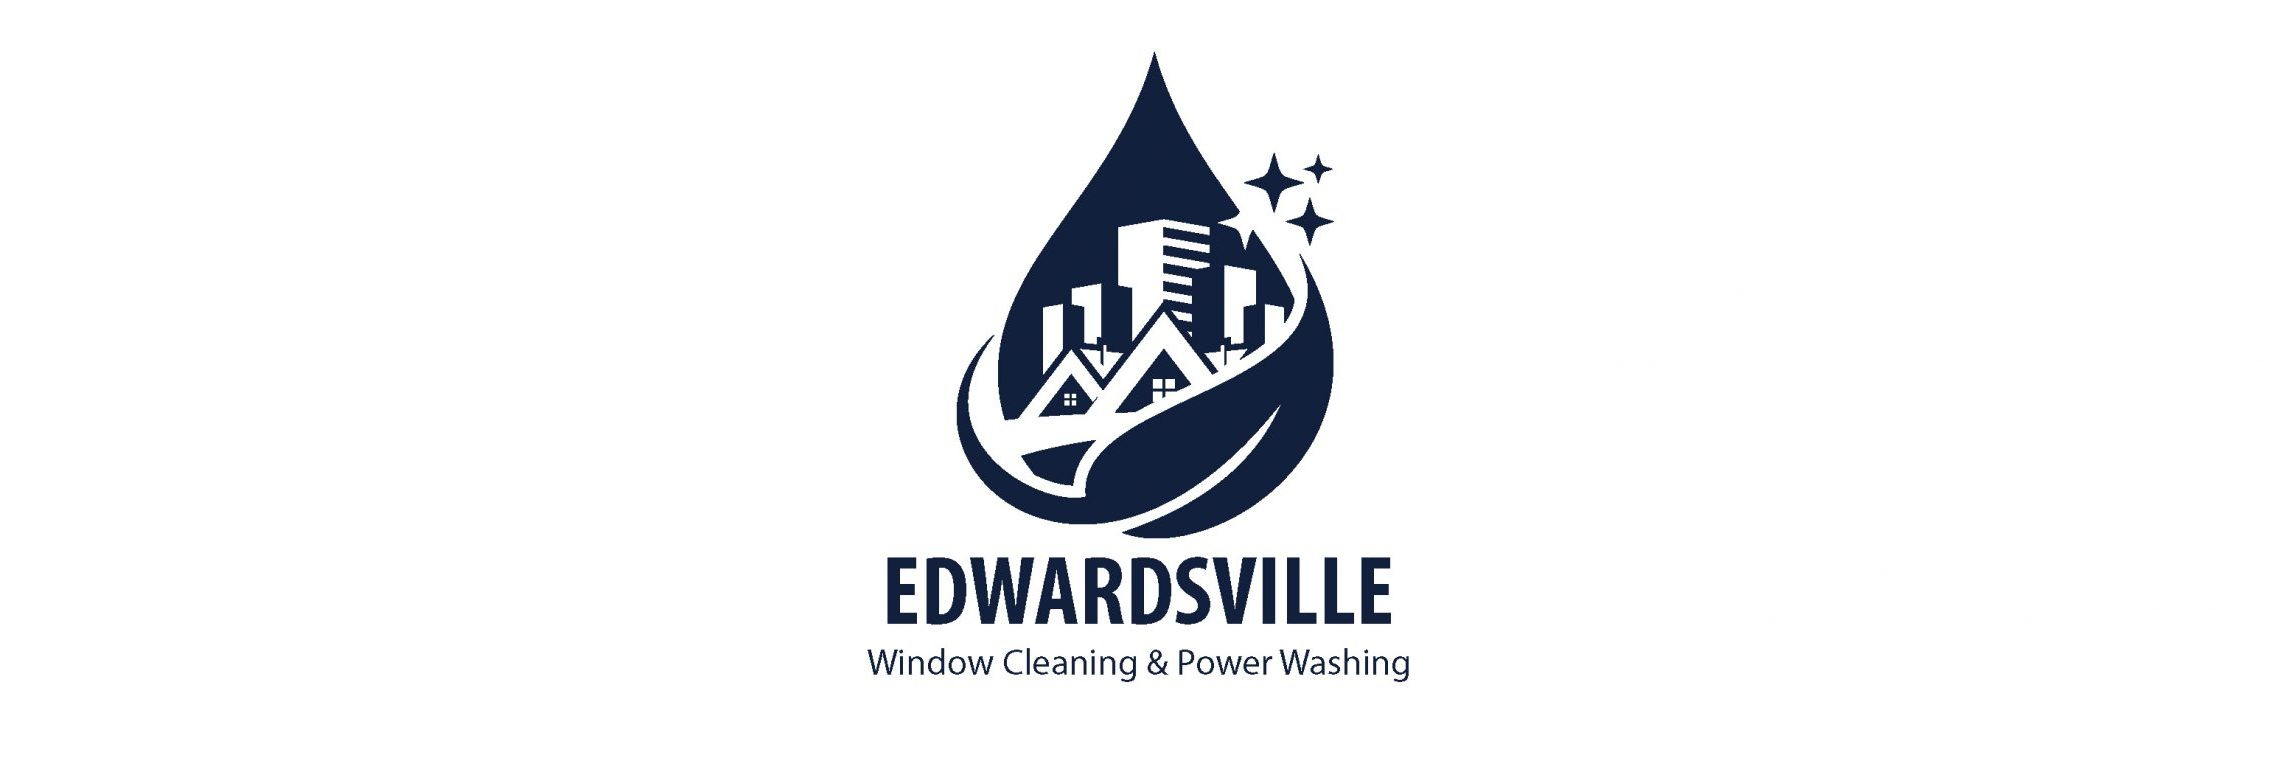 Edwardsville Window Cleaning & Power Washing